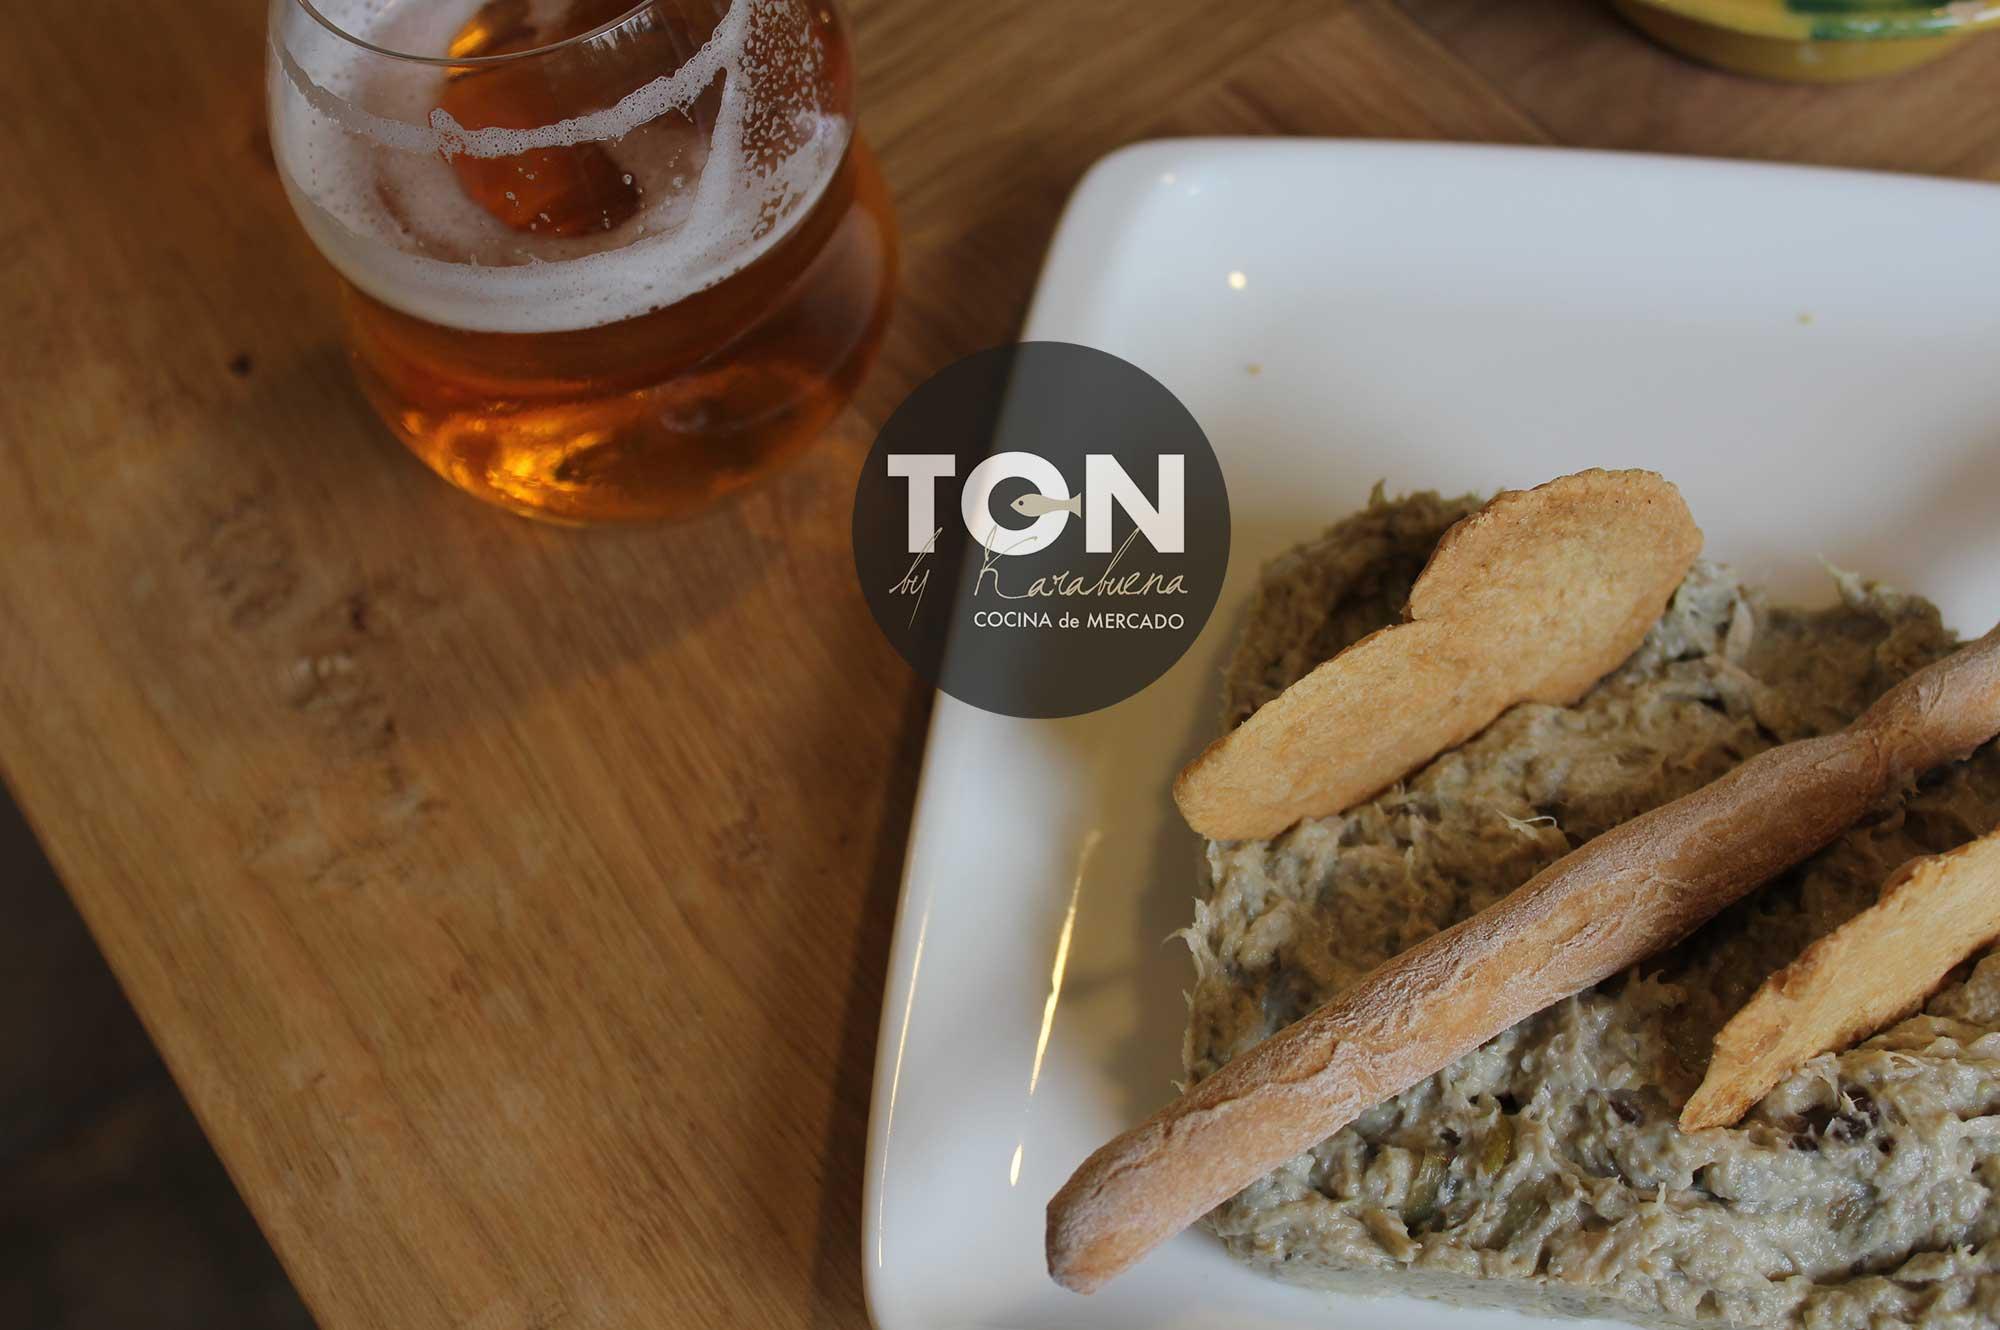 home-restaurante-ton-ensaladilla-alcachofa